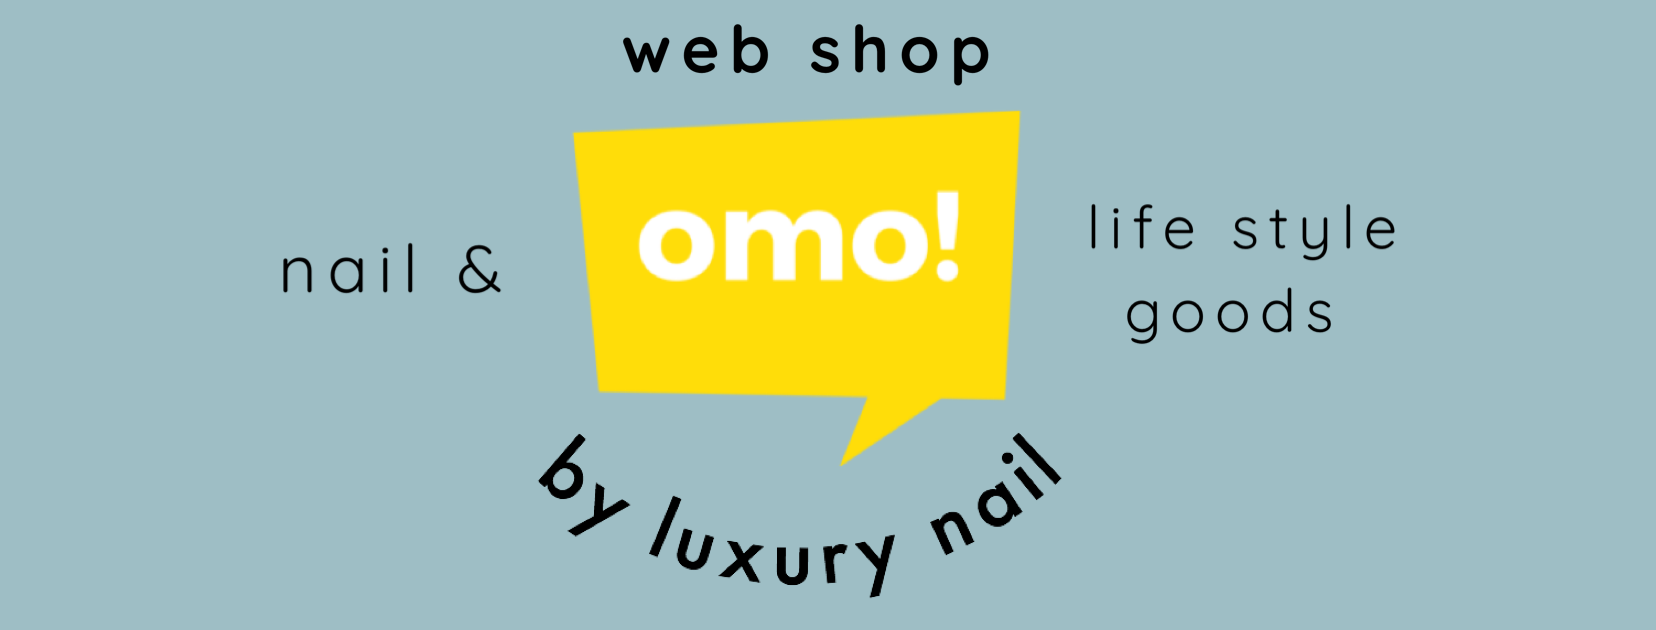 "Web shop ""omo!"" by luxury nail atelier"